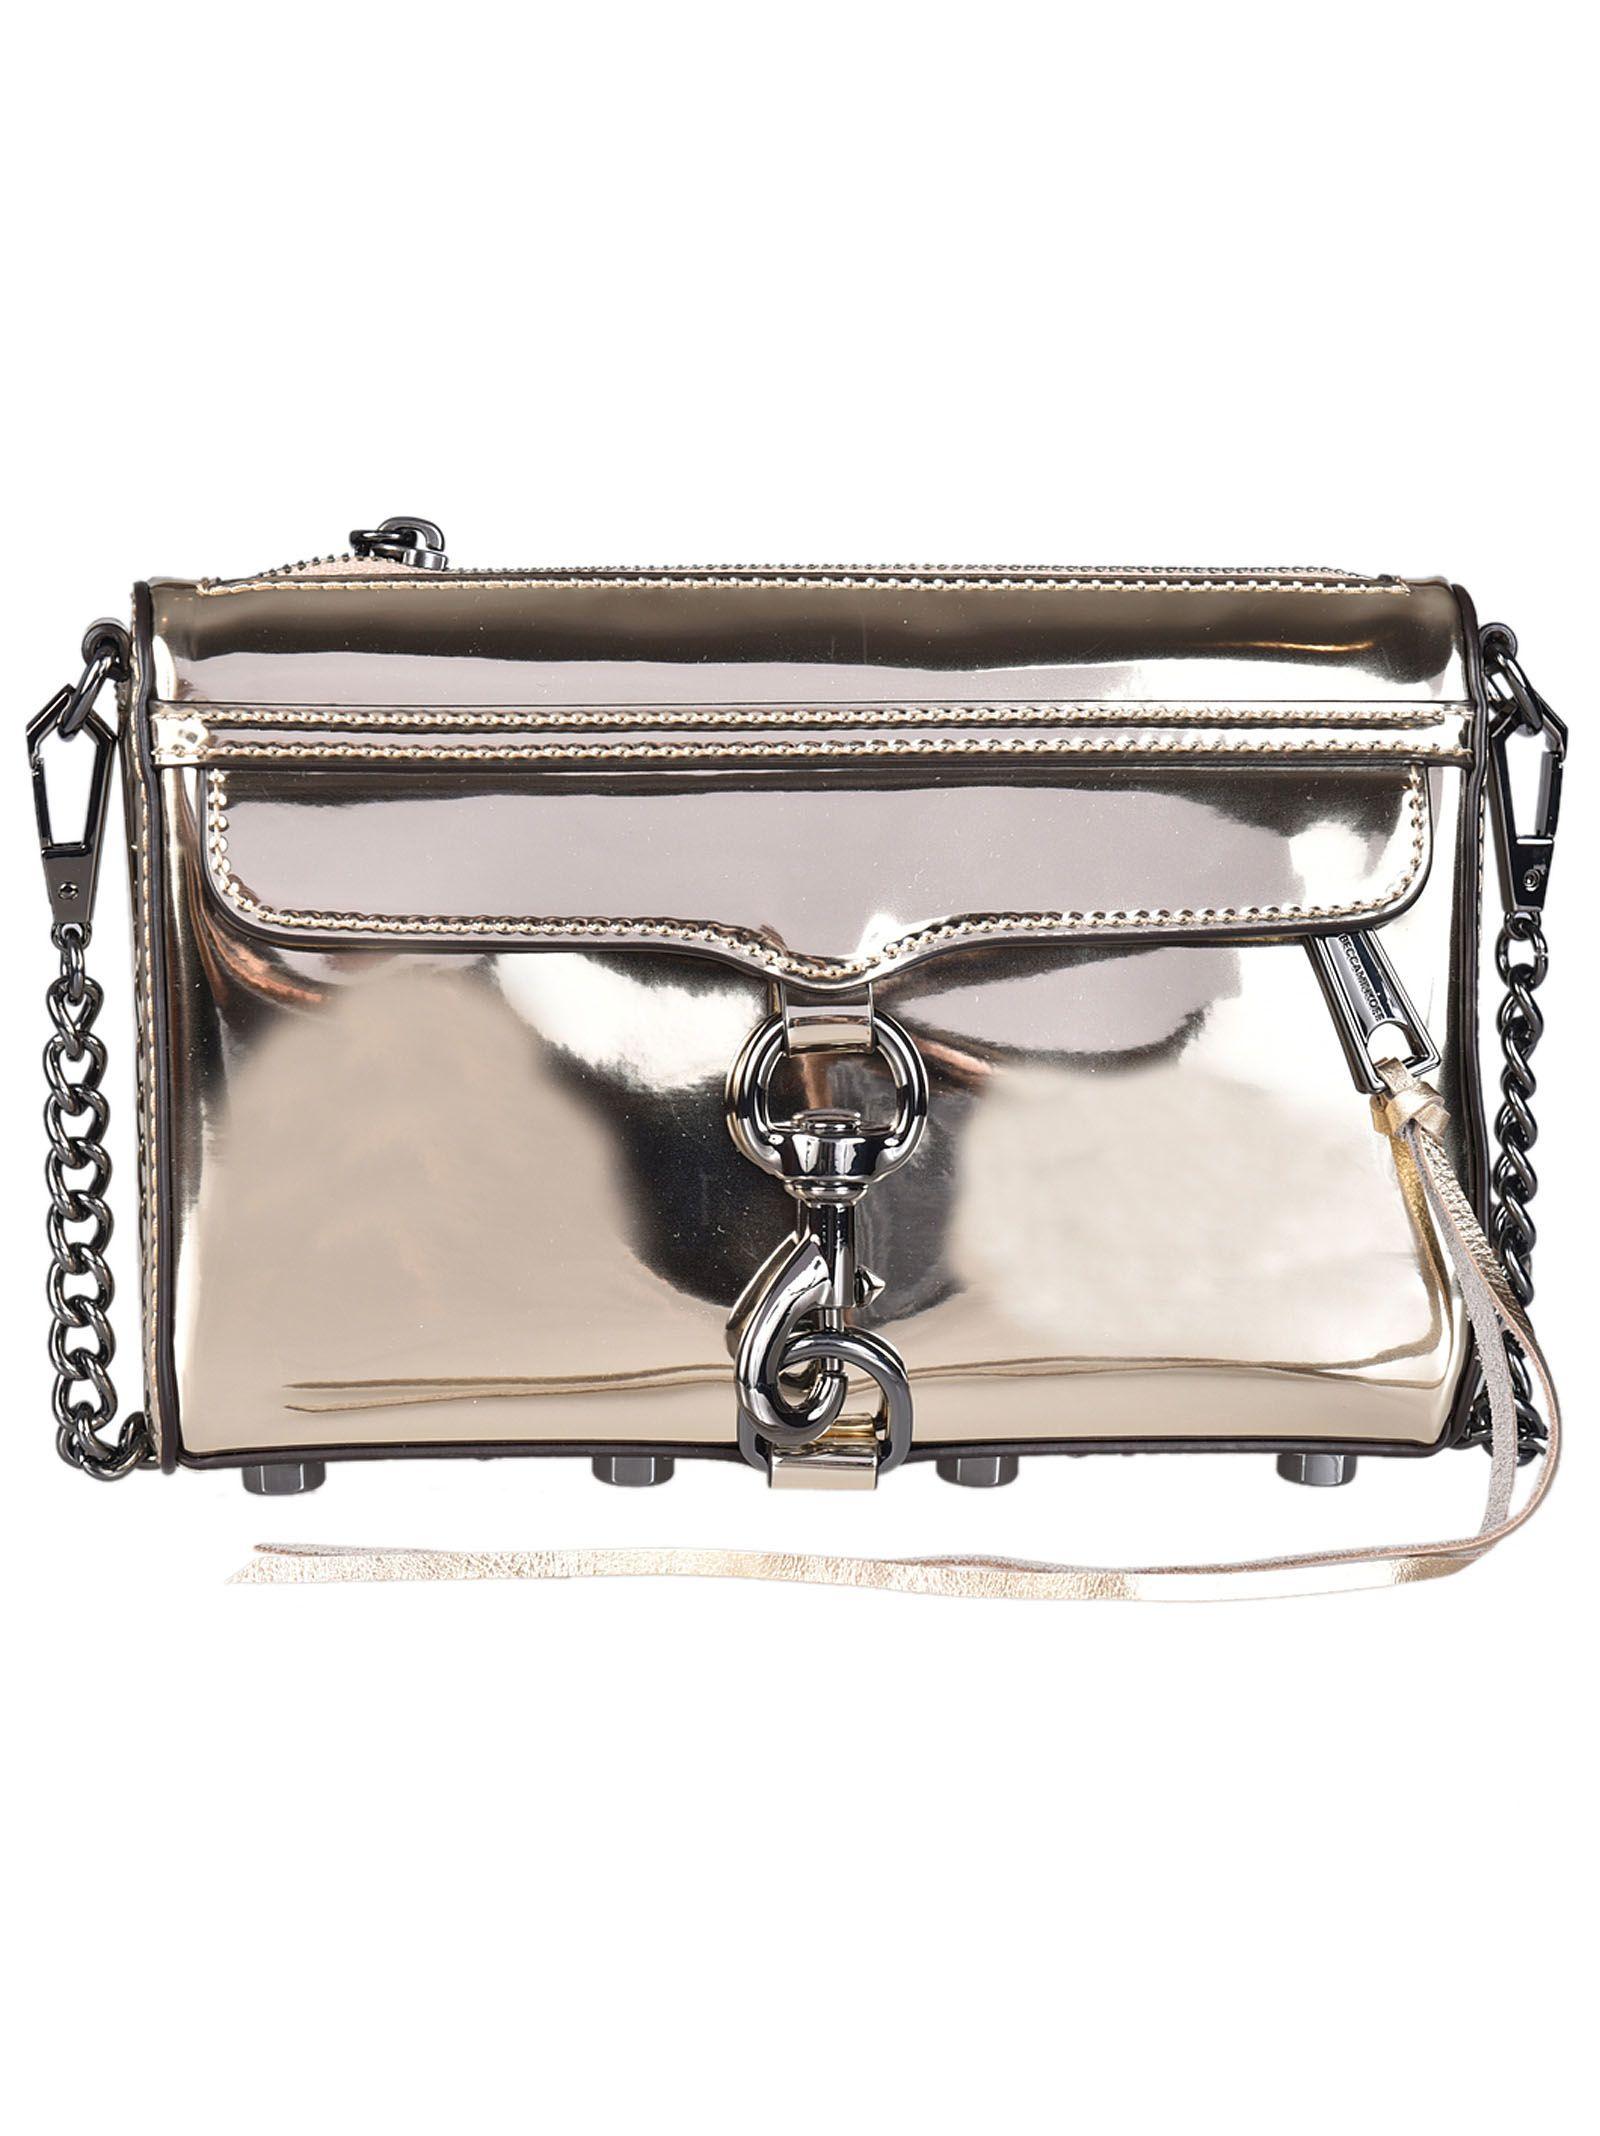 Rebecca Minkoff Mirrored Metallic Mini Shoulder Bag